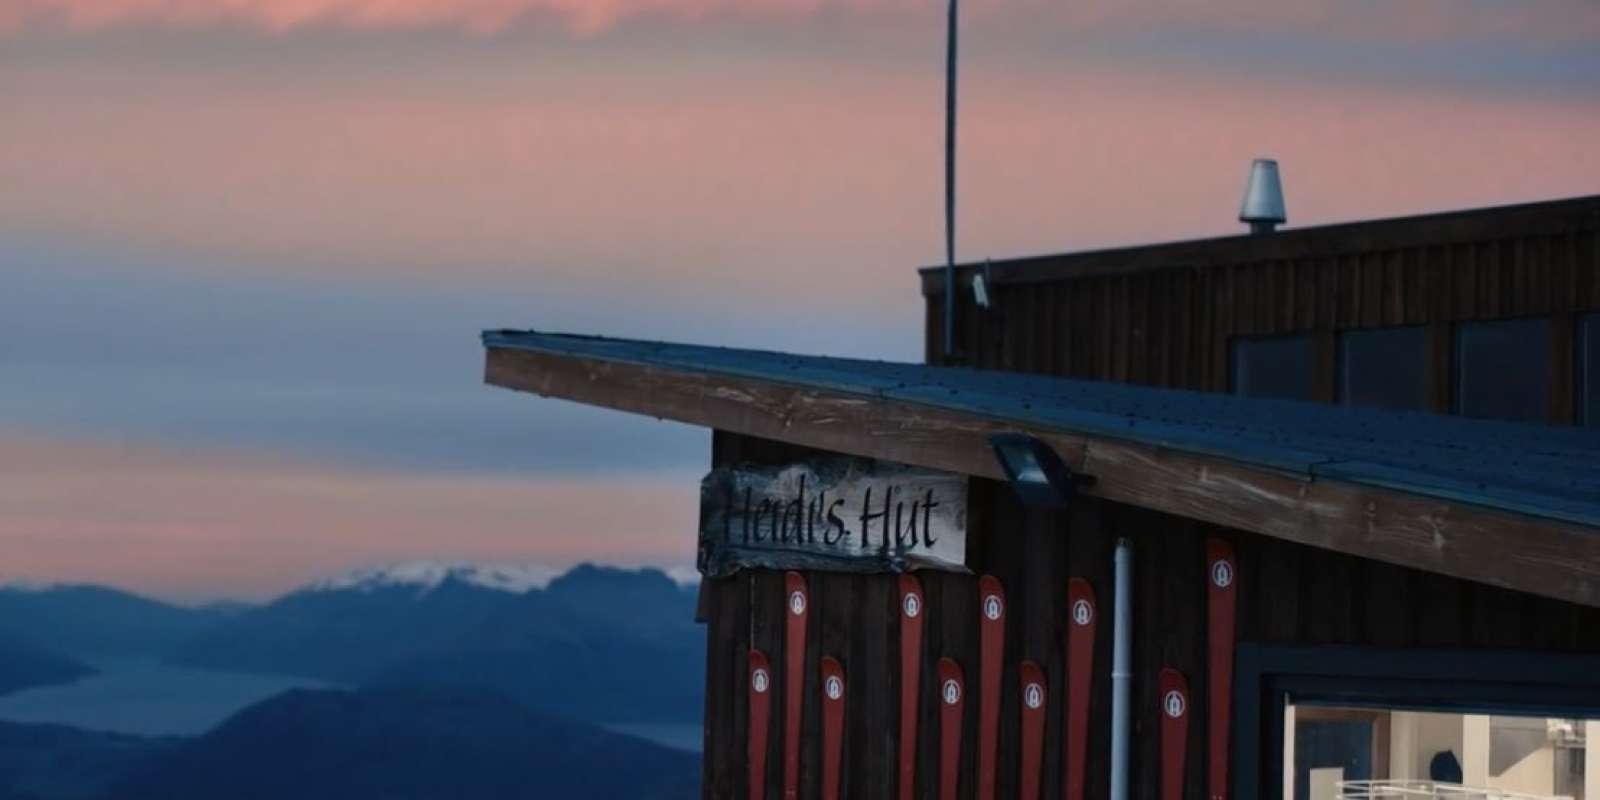 Heidi's Hut, Coronet Peak